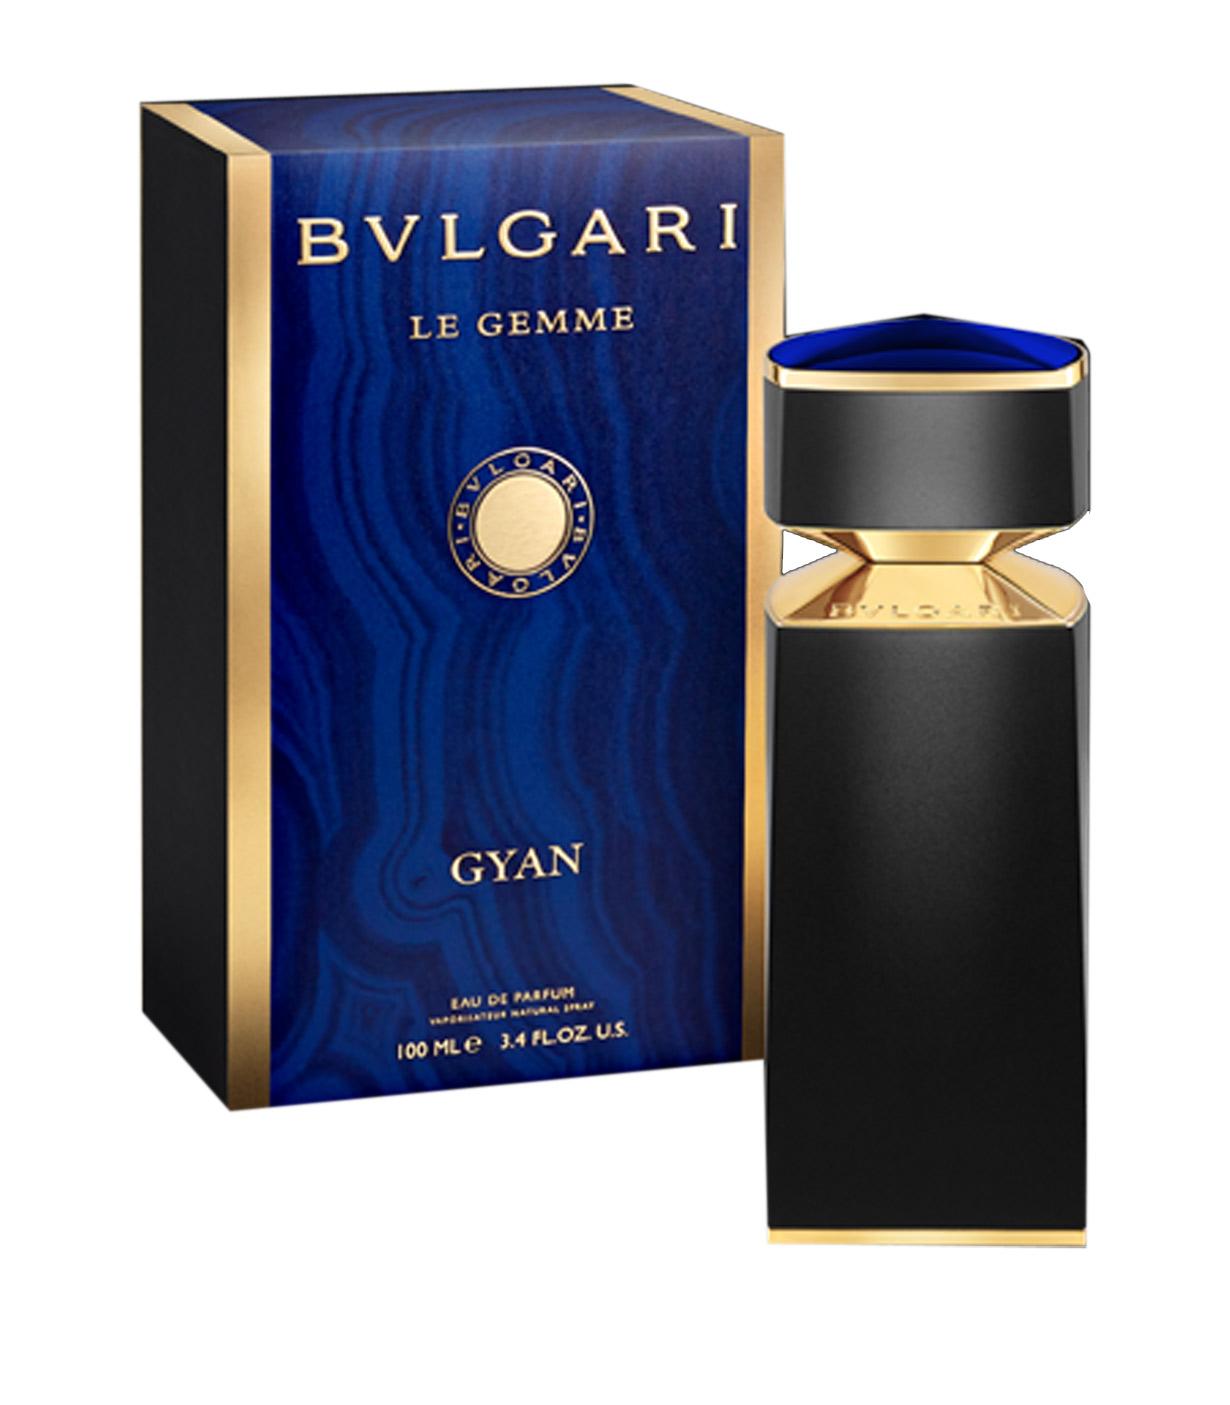 Homme Cologne Parfum Bvlgari Gyan 2016 Pour Un Aqc543SLRj